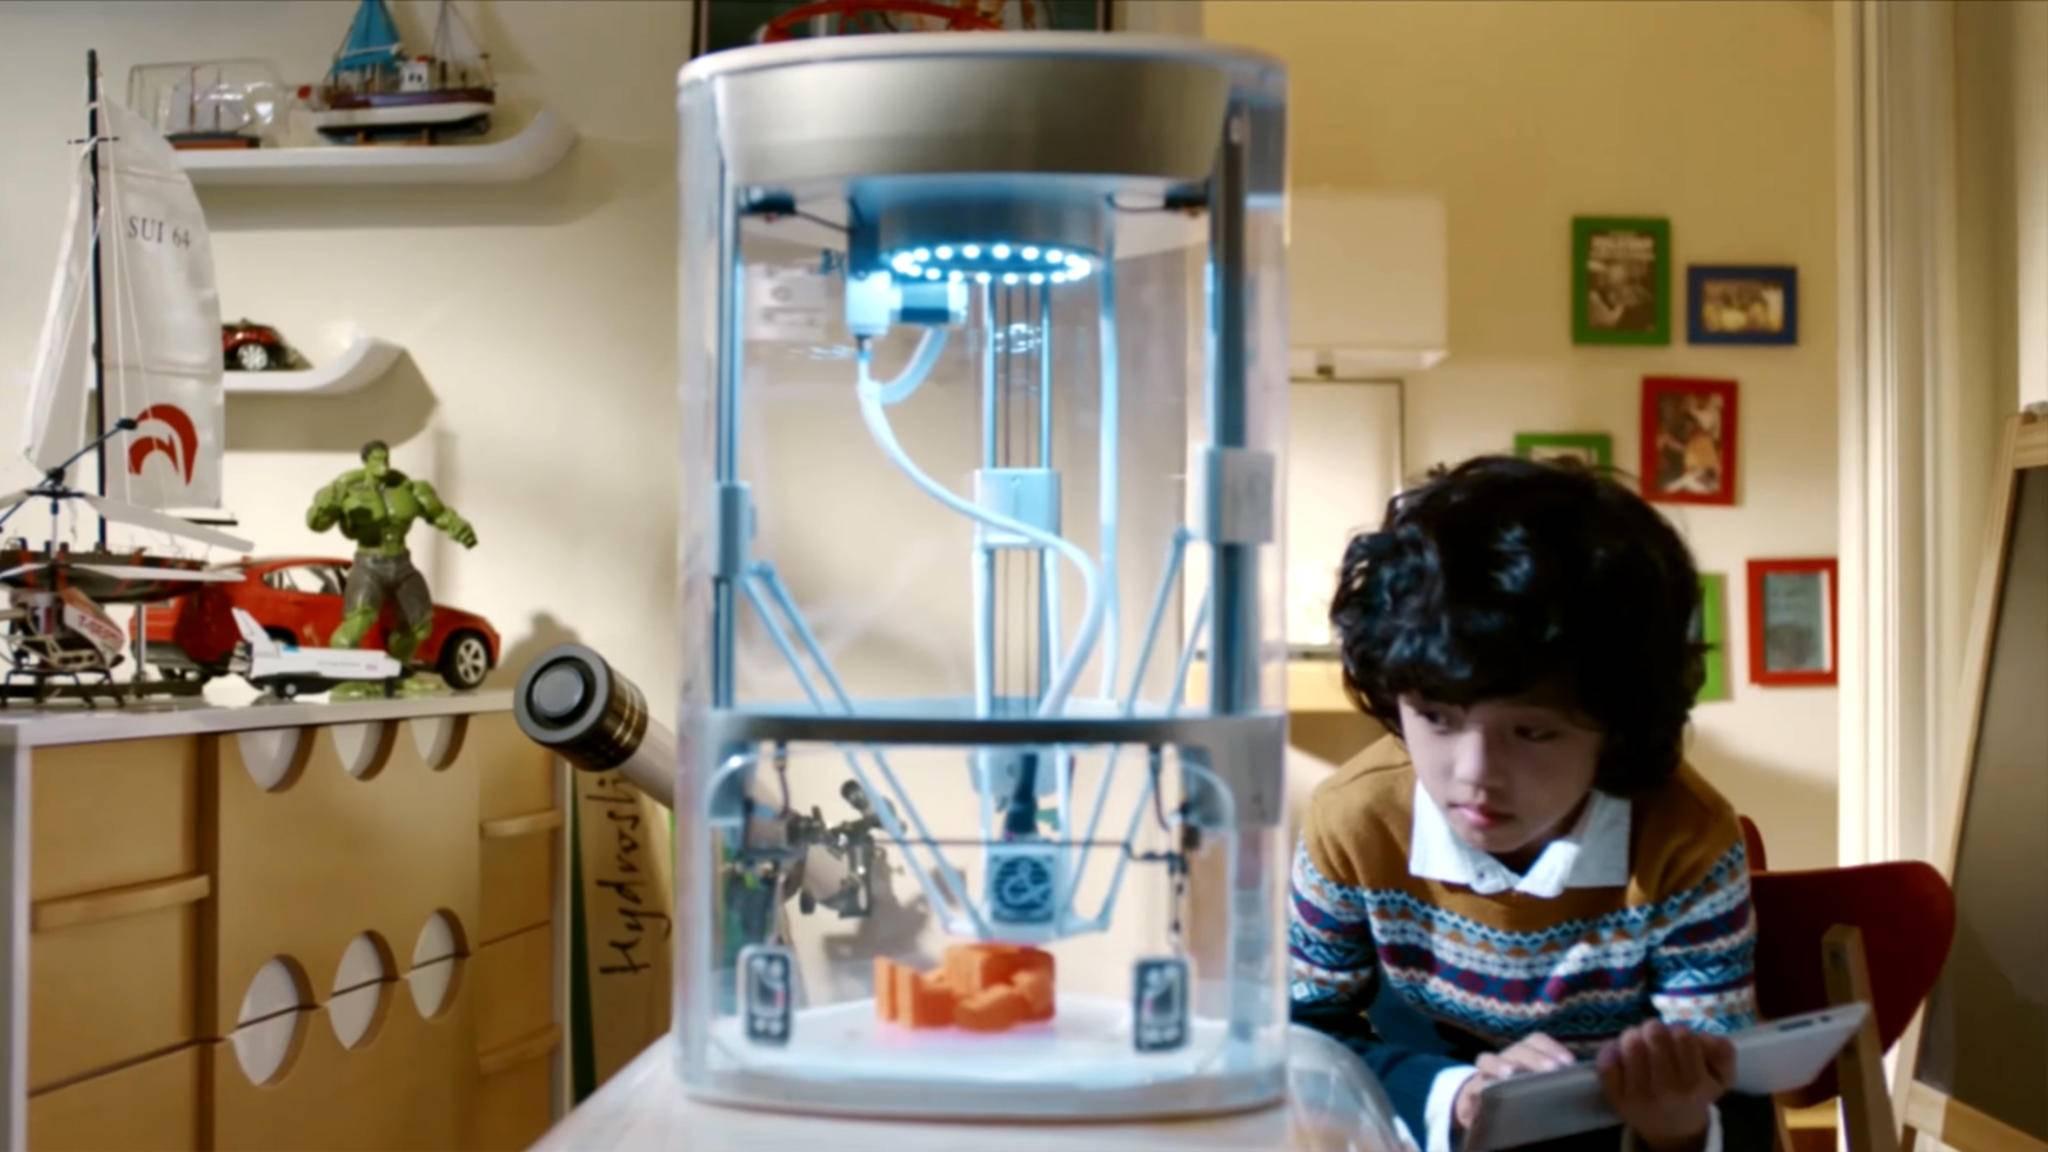 Der 3D-Drucker Yeehawrichtet sich explizit an Kinder.